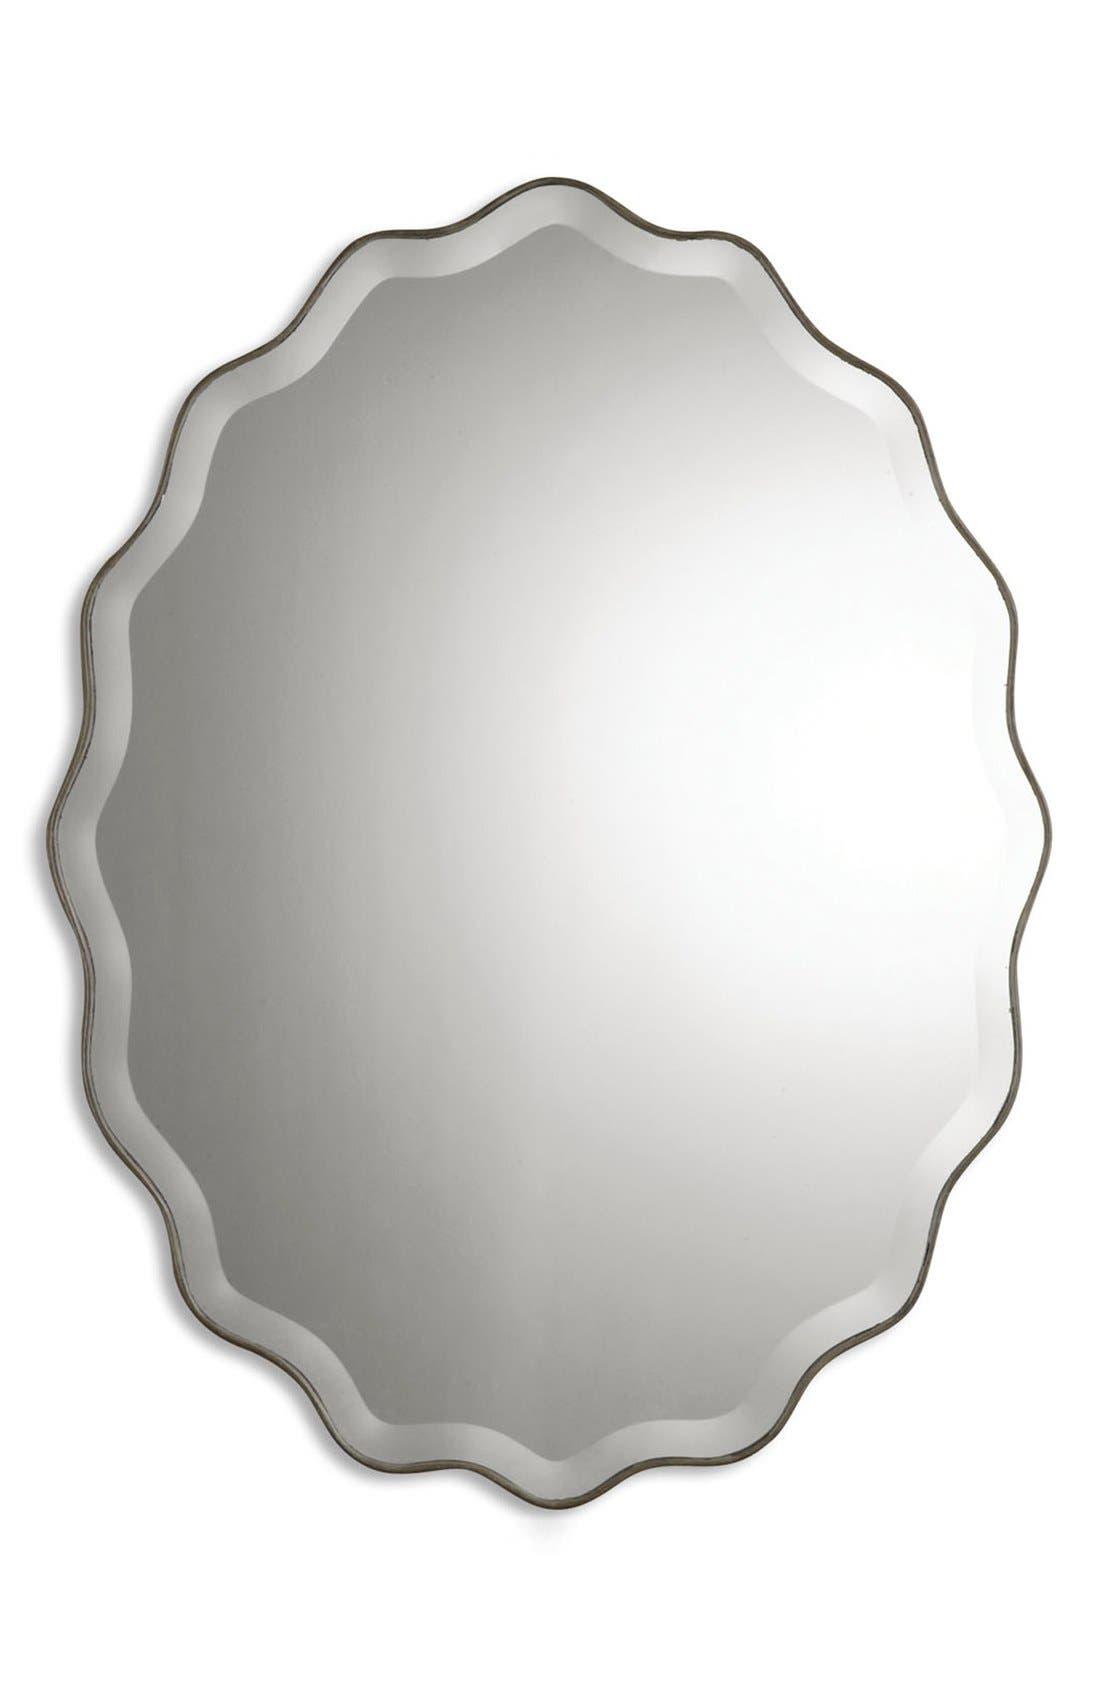 Uttermost 'Teodora' Ruffle Edge Mirror